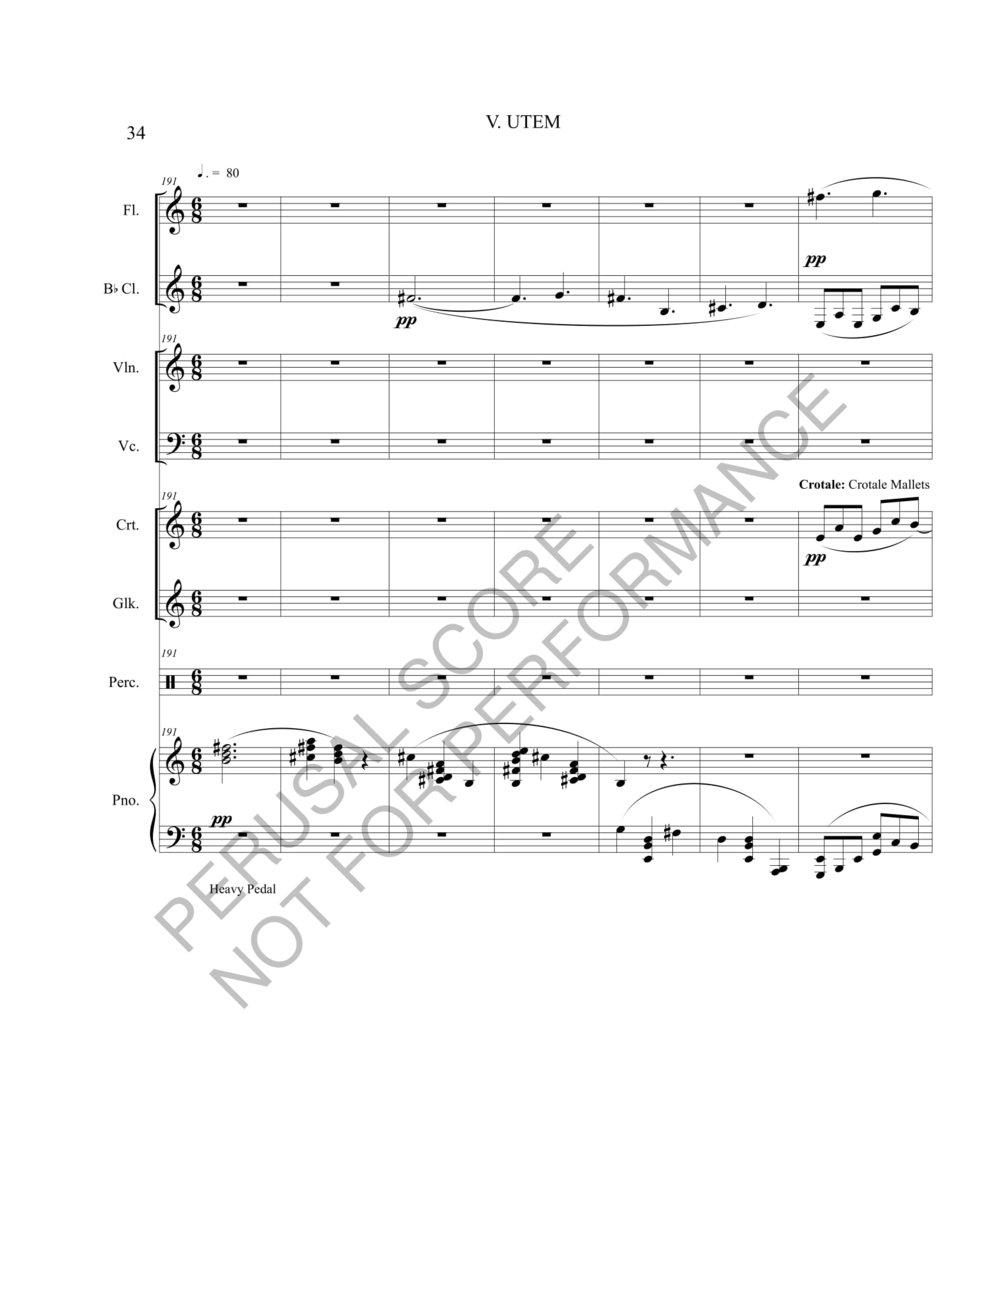 Boyd Terra Liberi Score-watermark-40.jpg